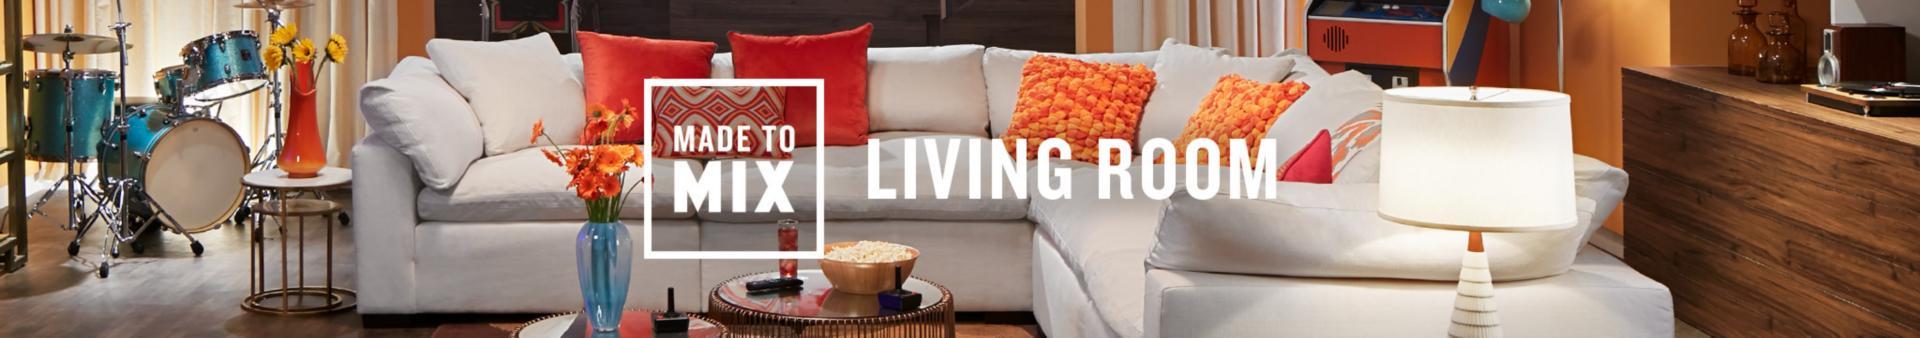 MIX Living Room Furniture Value City Furniture